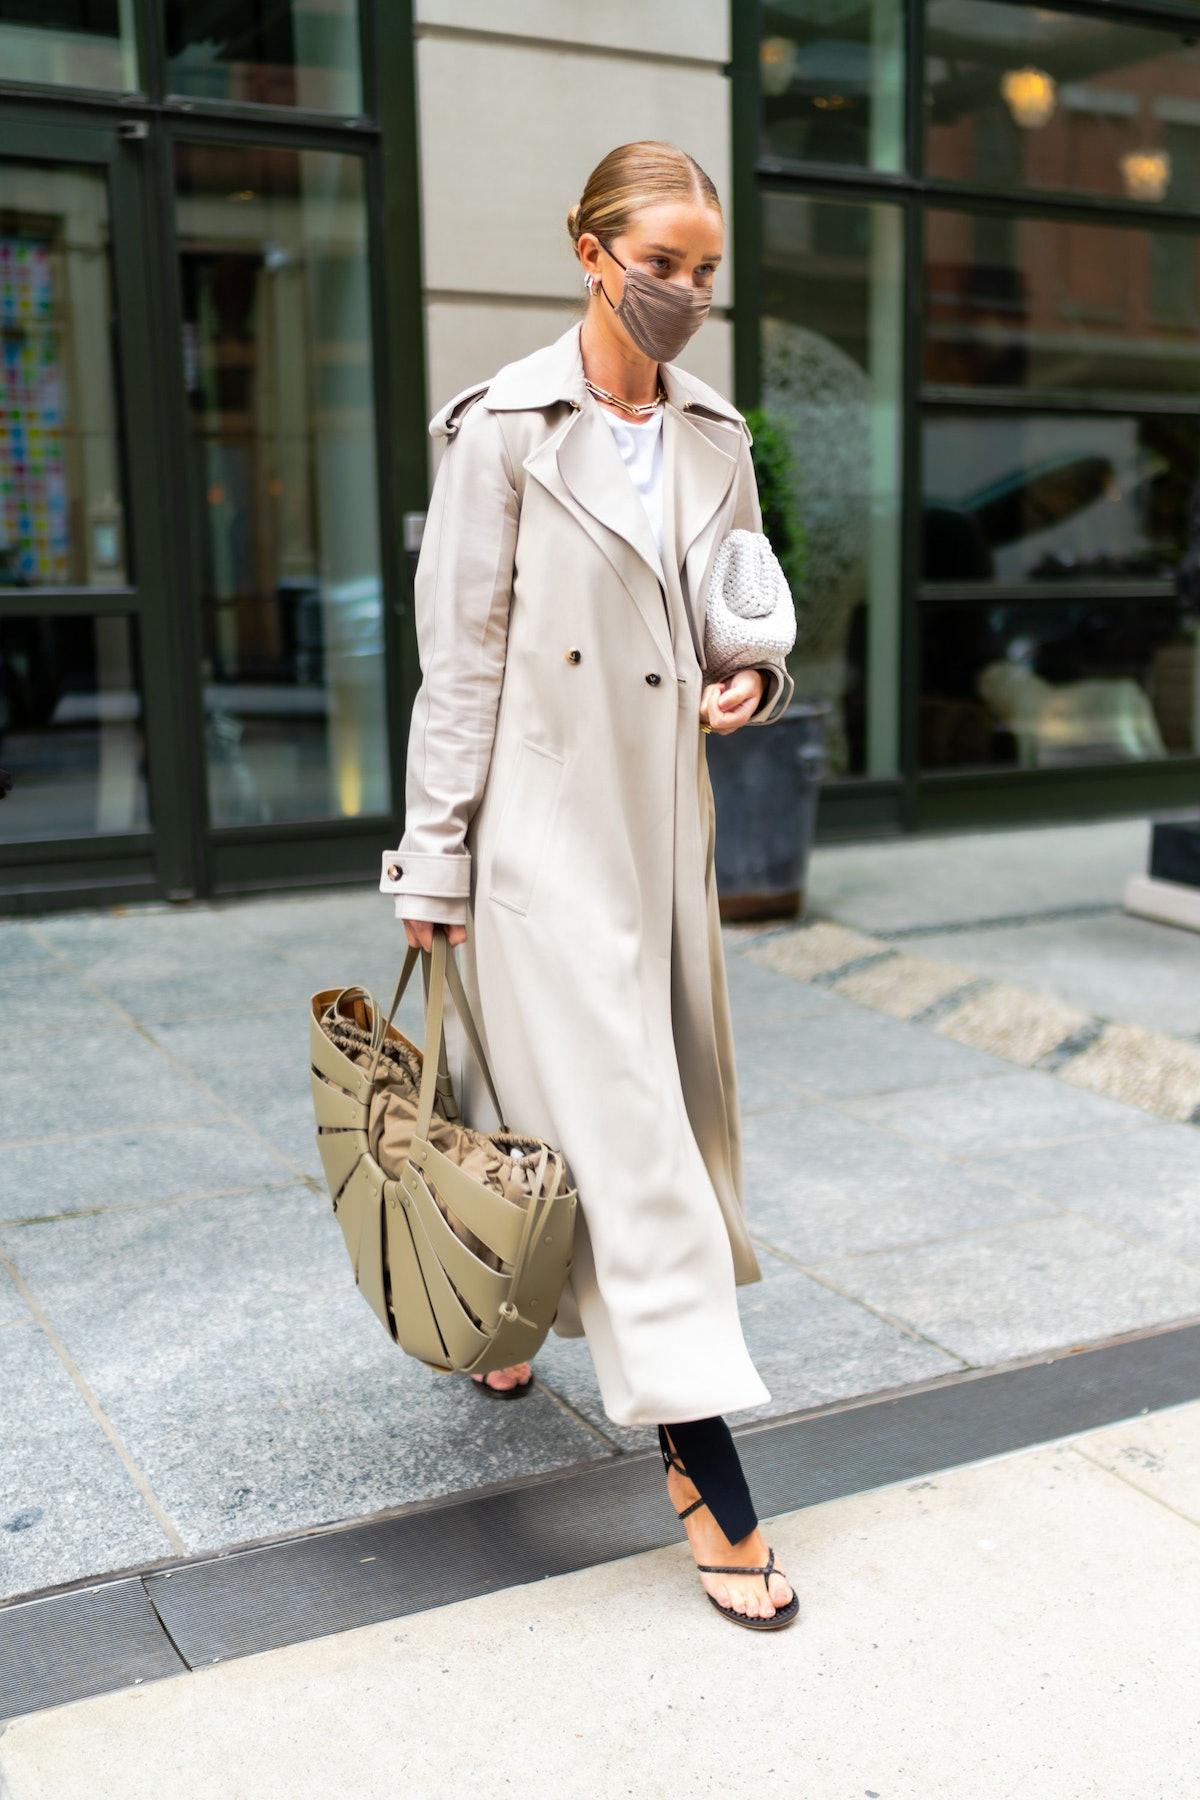 NEW YORK, NEW YORK - APRIL 13: Rosie Huntington-Whiteley is seen in SoHo on April 13, 2021 in New Yo...